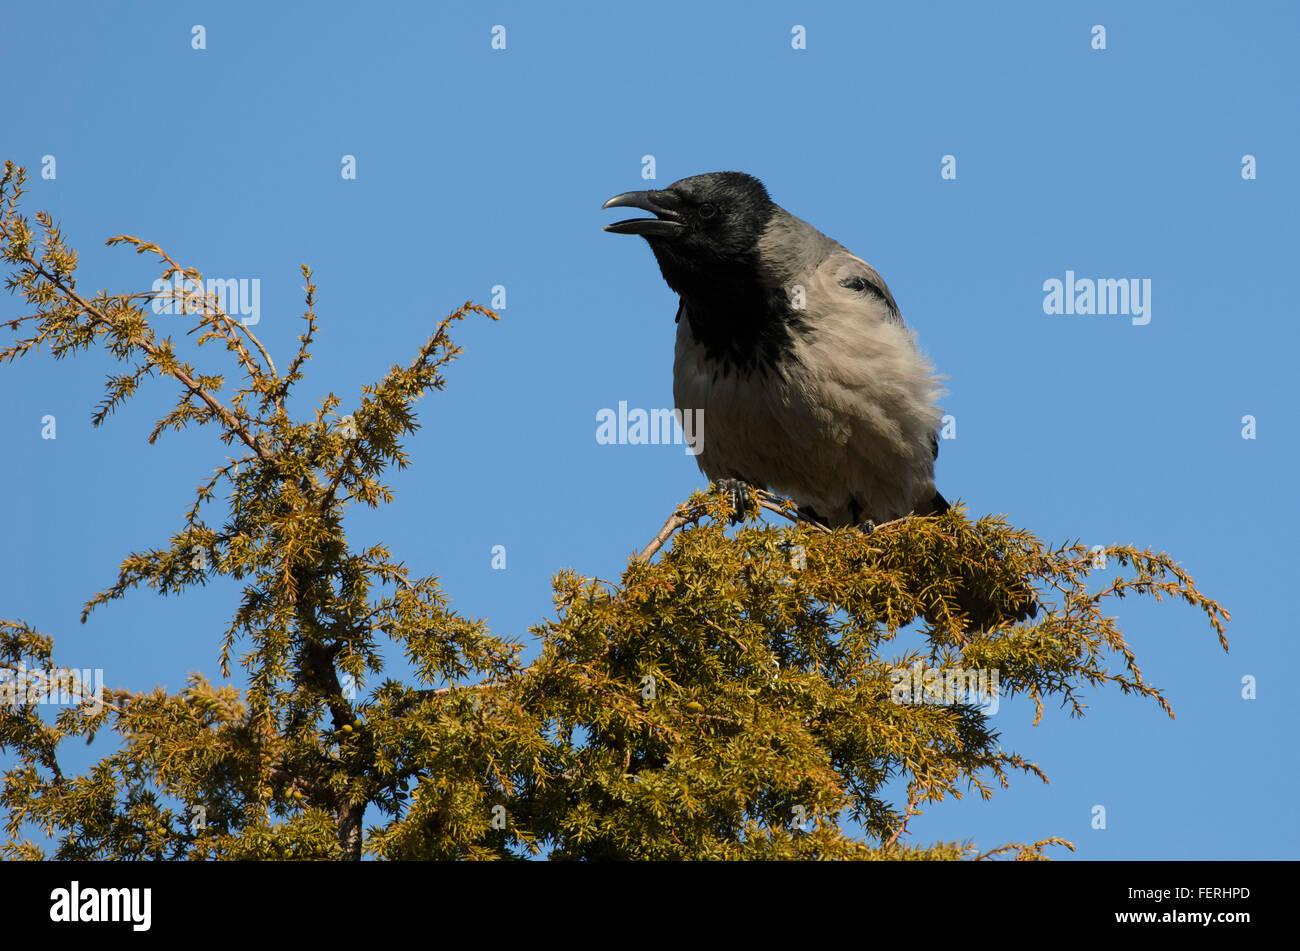 Hooded Crow Corvus cornix sitting on treetop and croaking - Stock Image